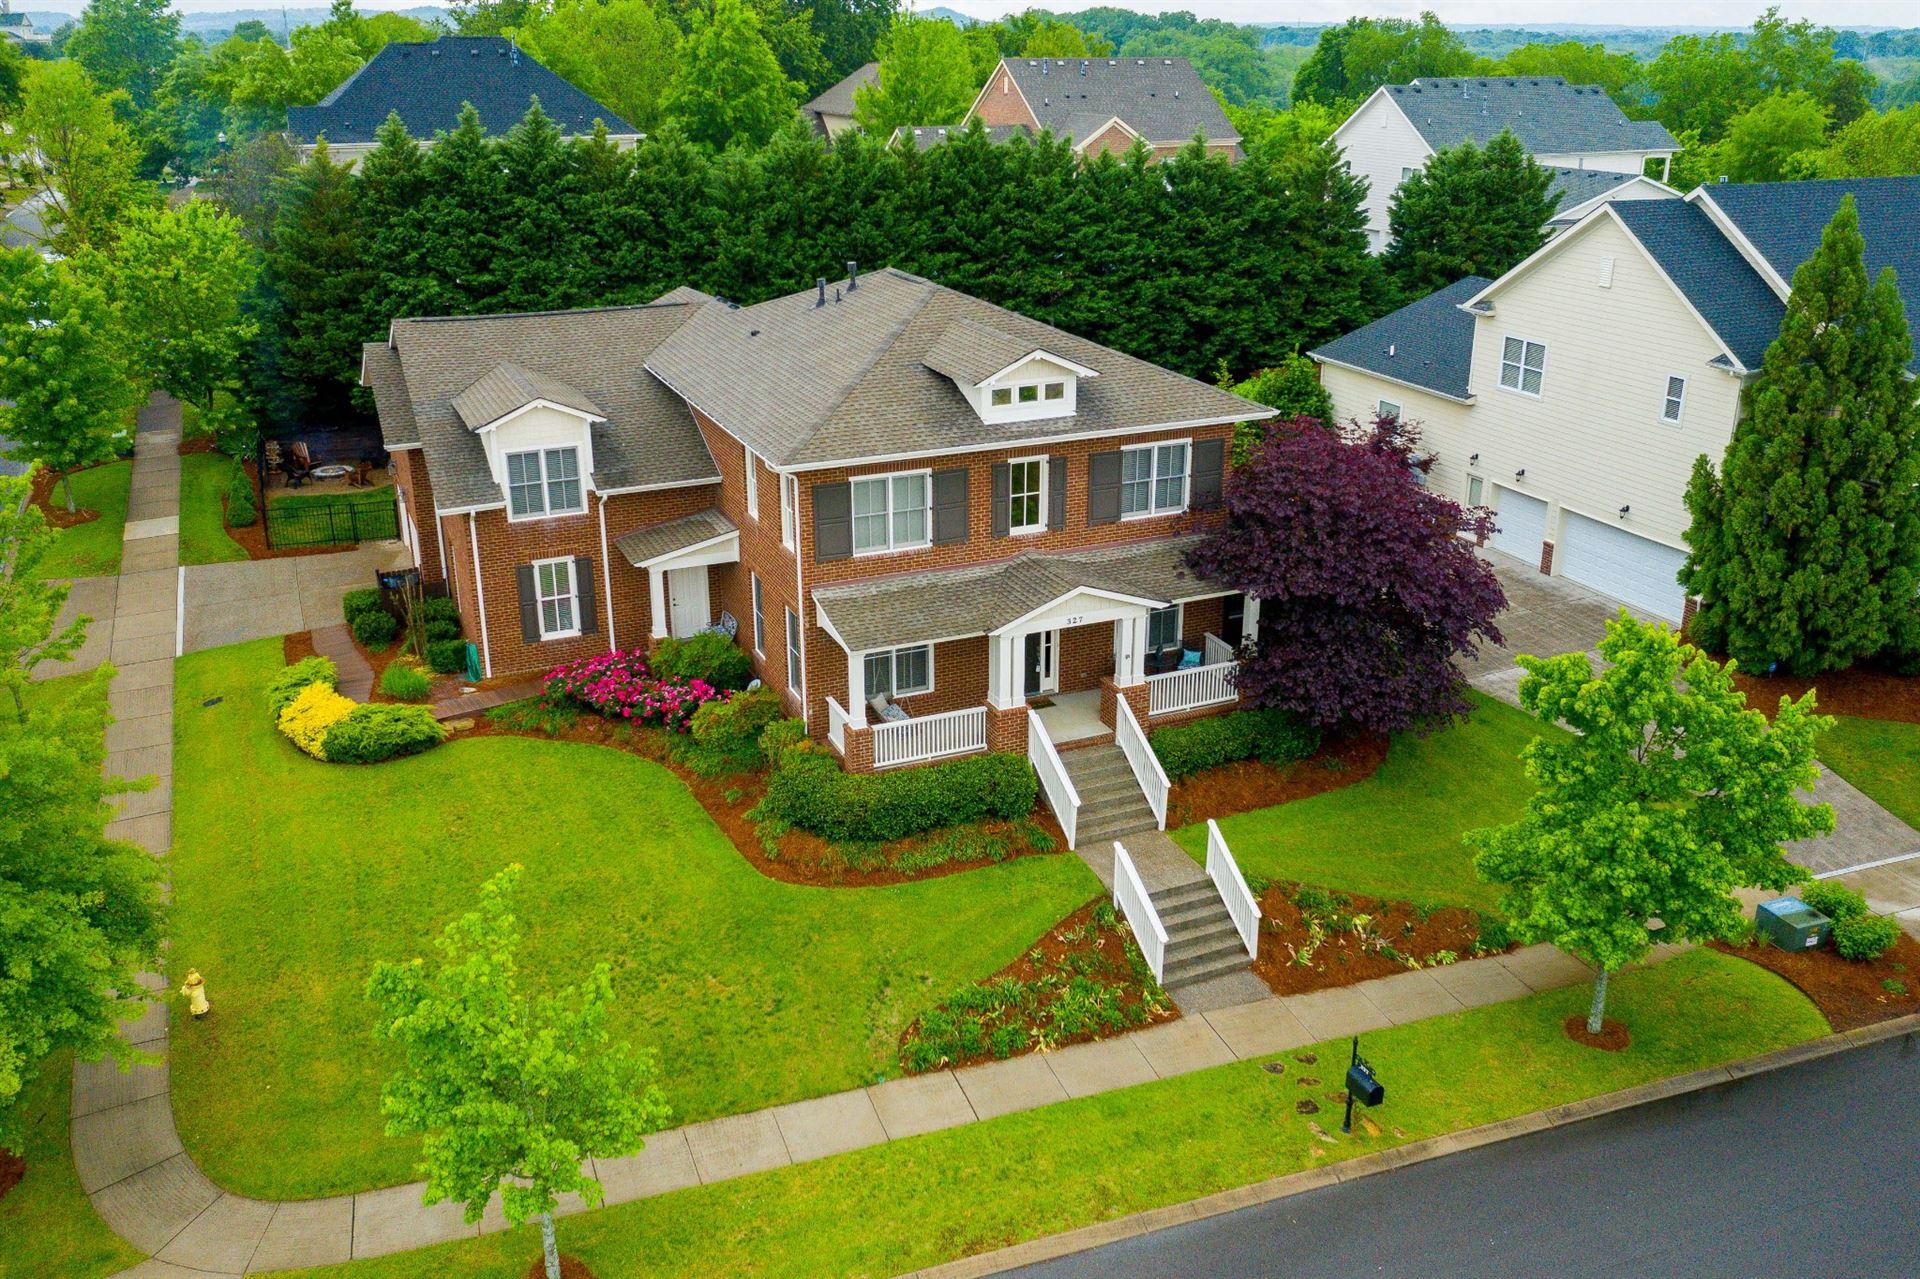 327 Wise Rd, Franklin, TN 37064 - MLS#: 2242573